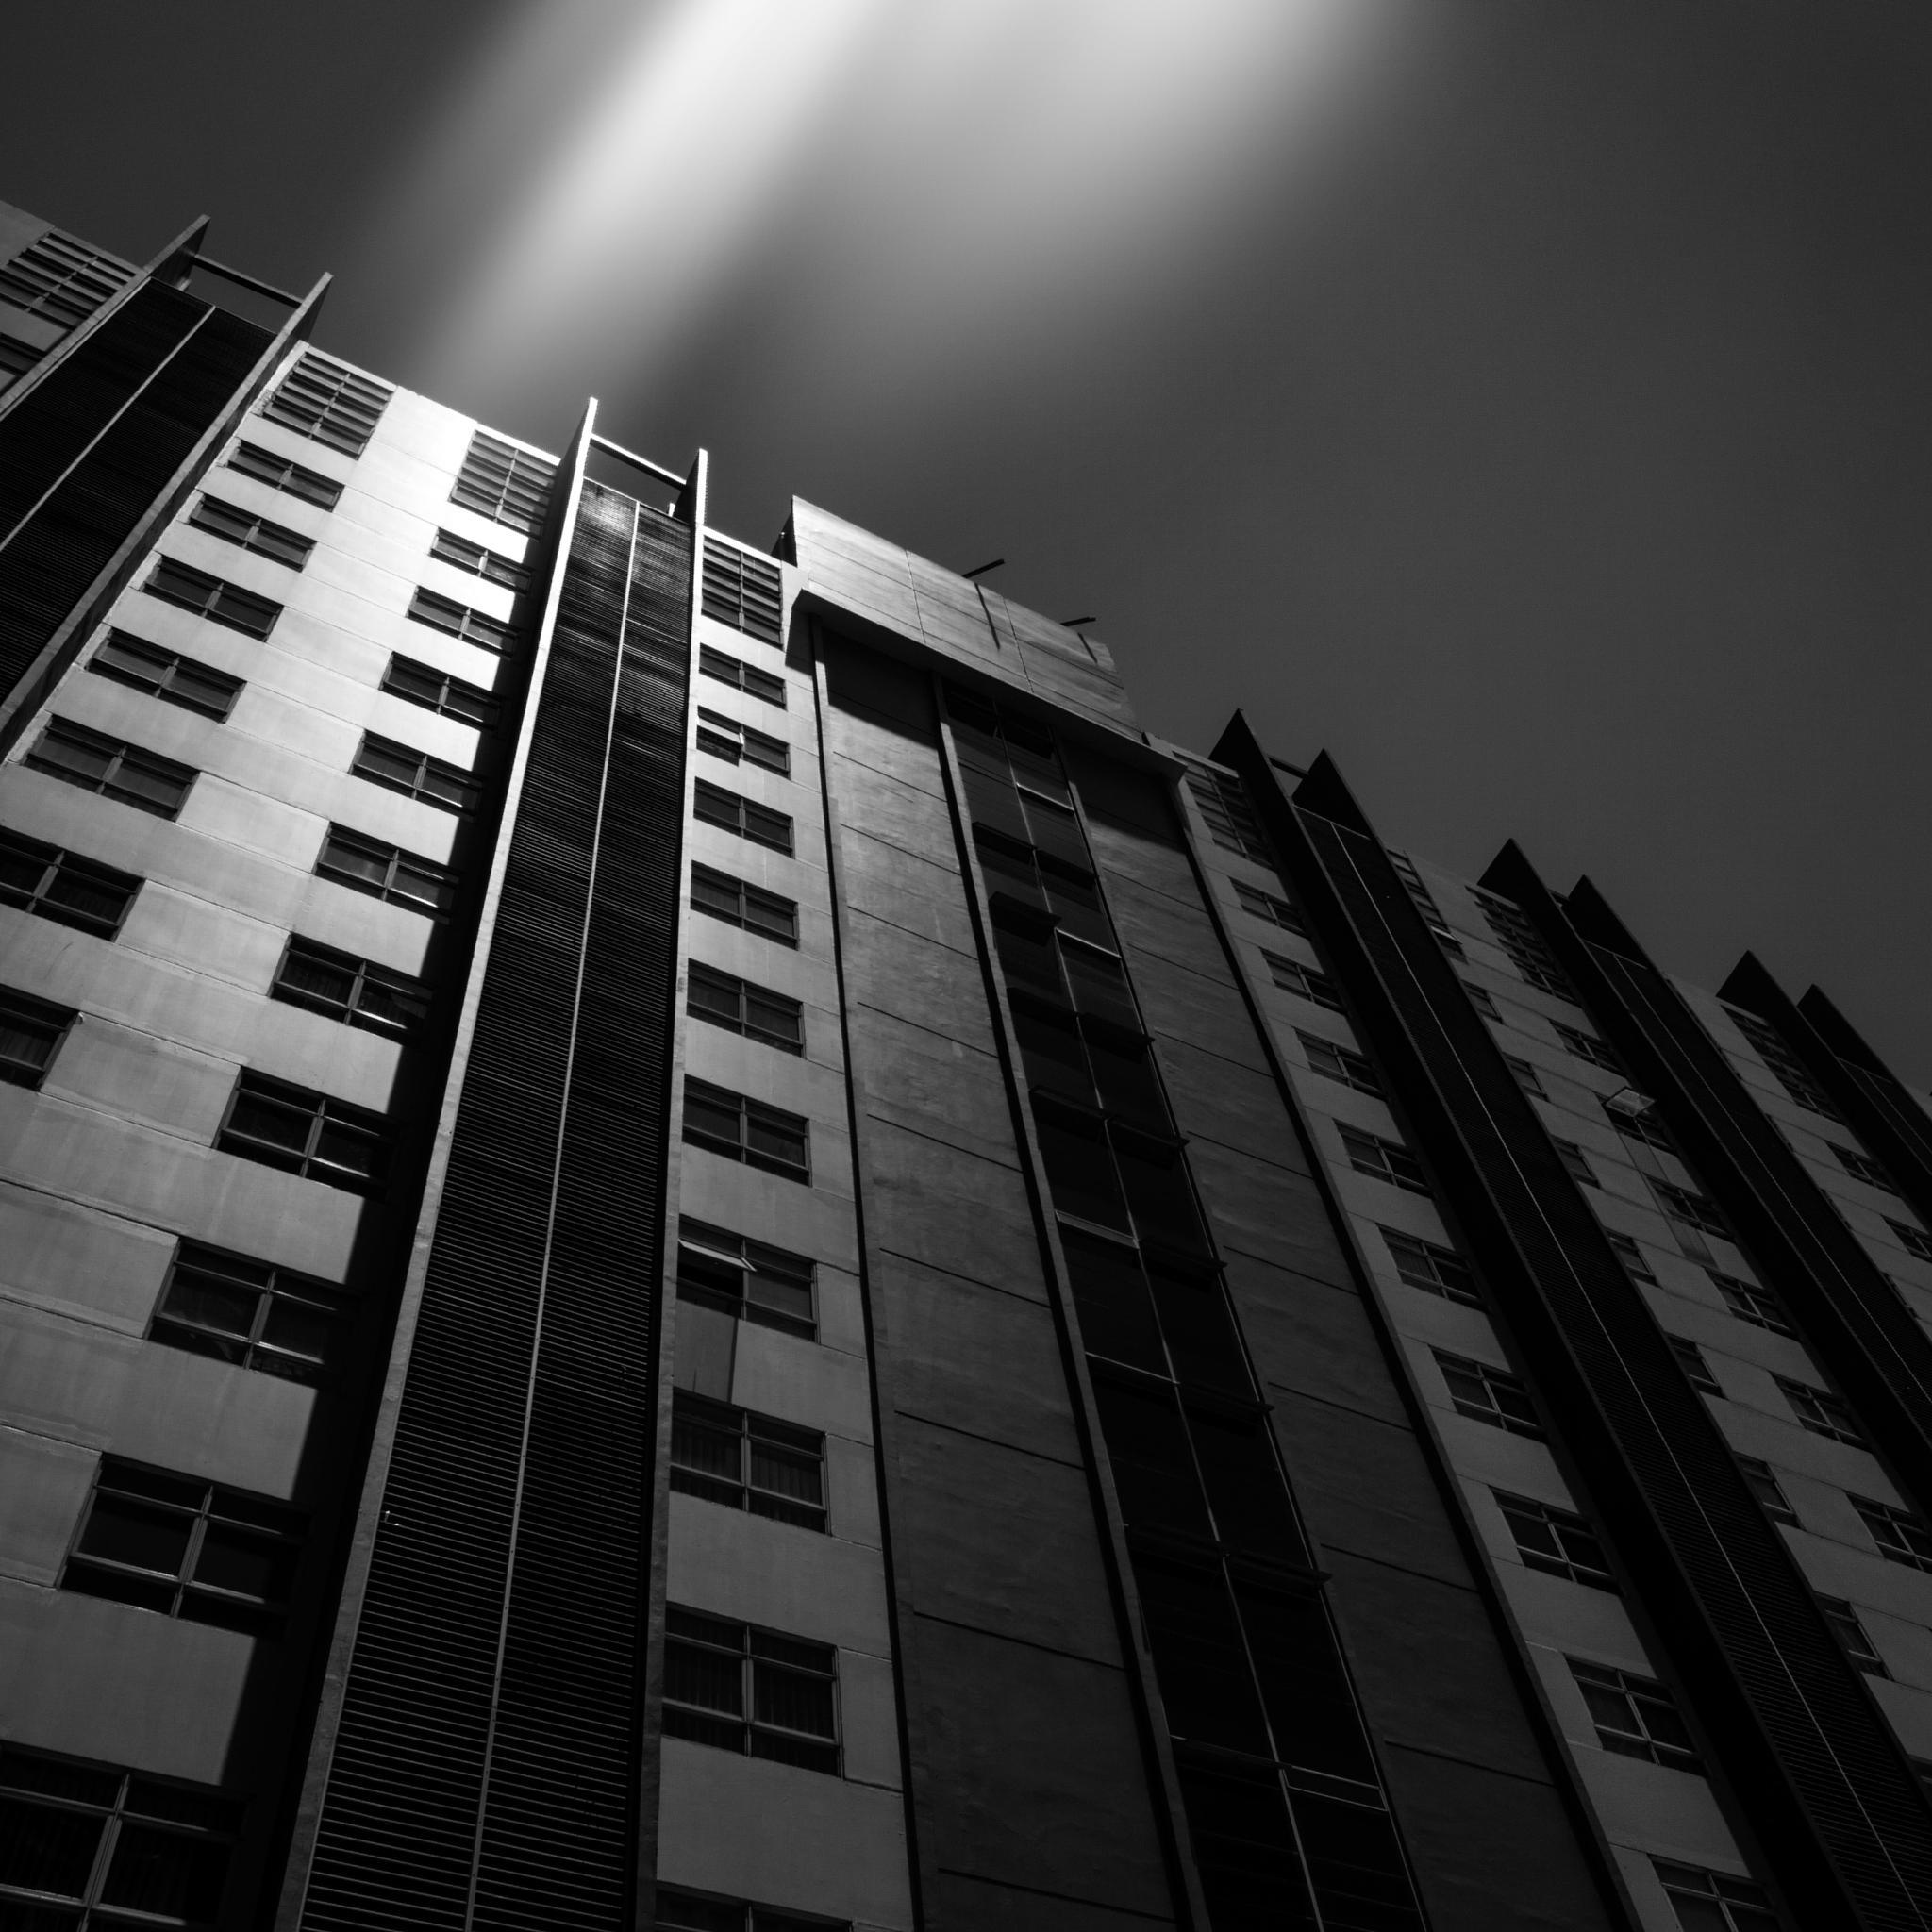 The higher ... by Daniel Tjongari